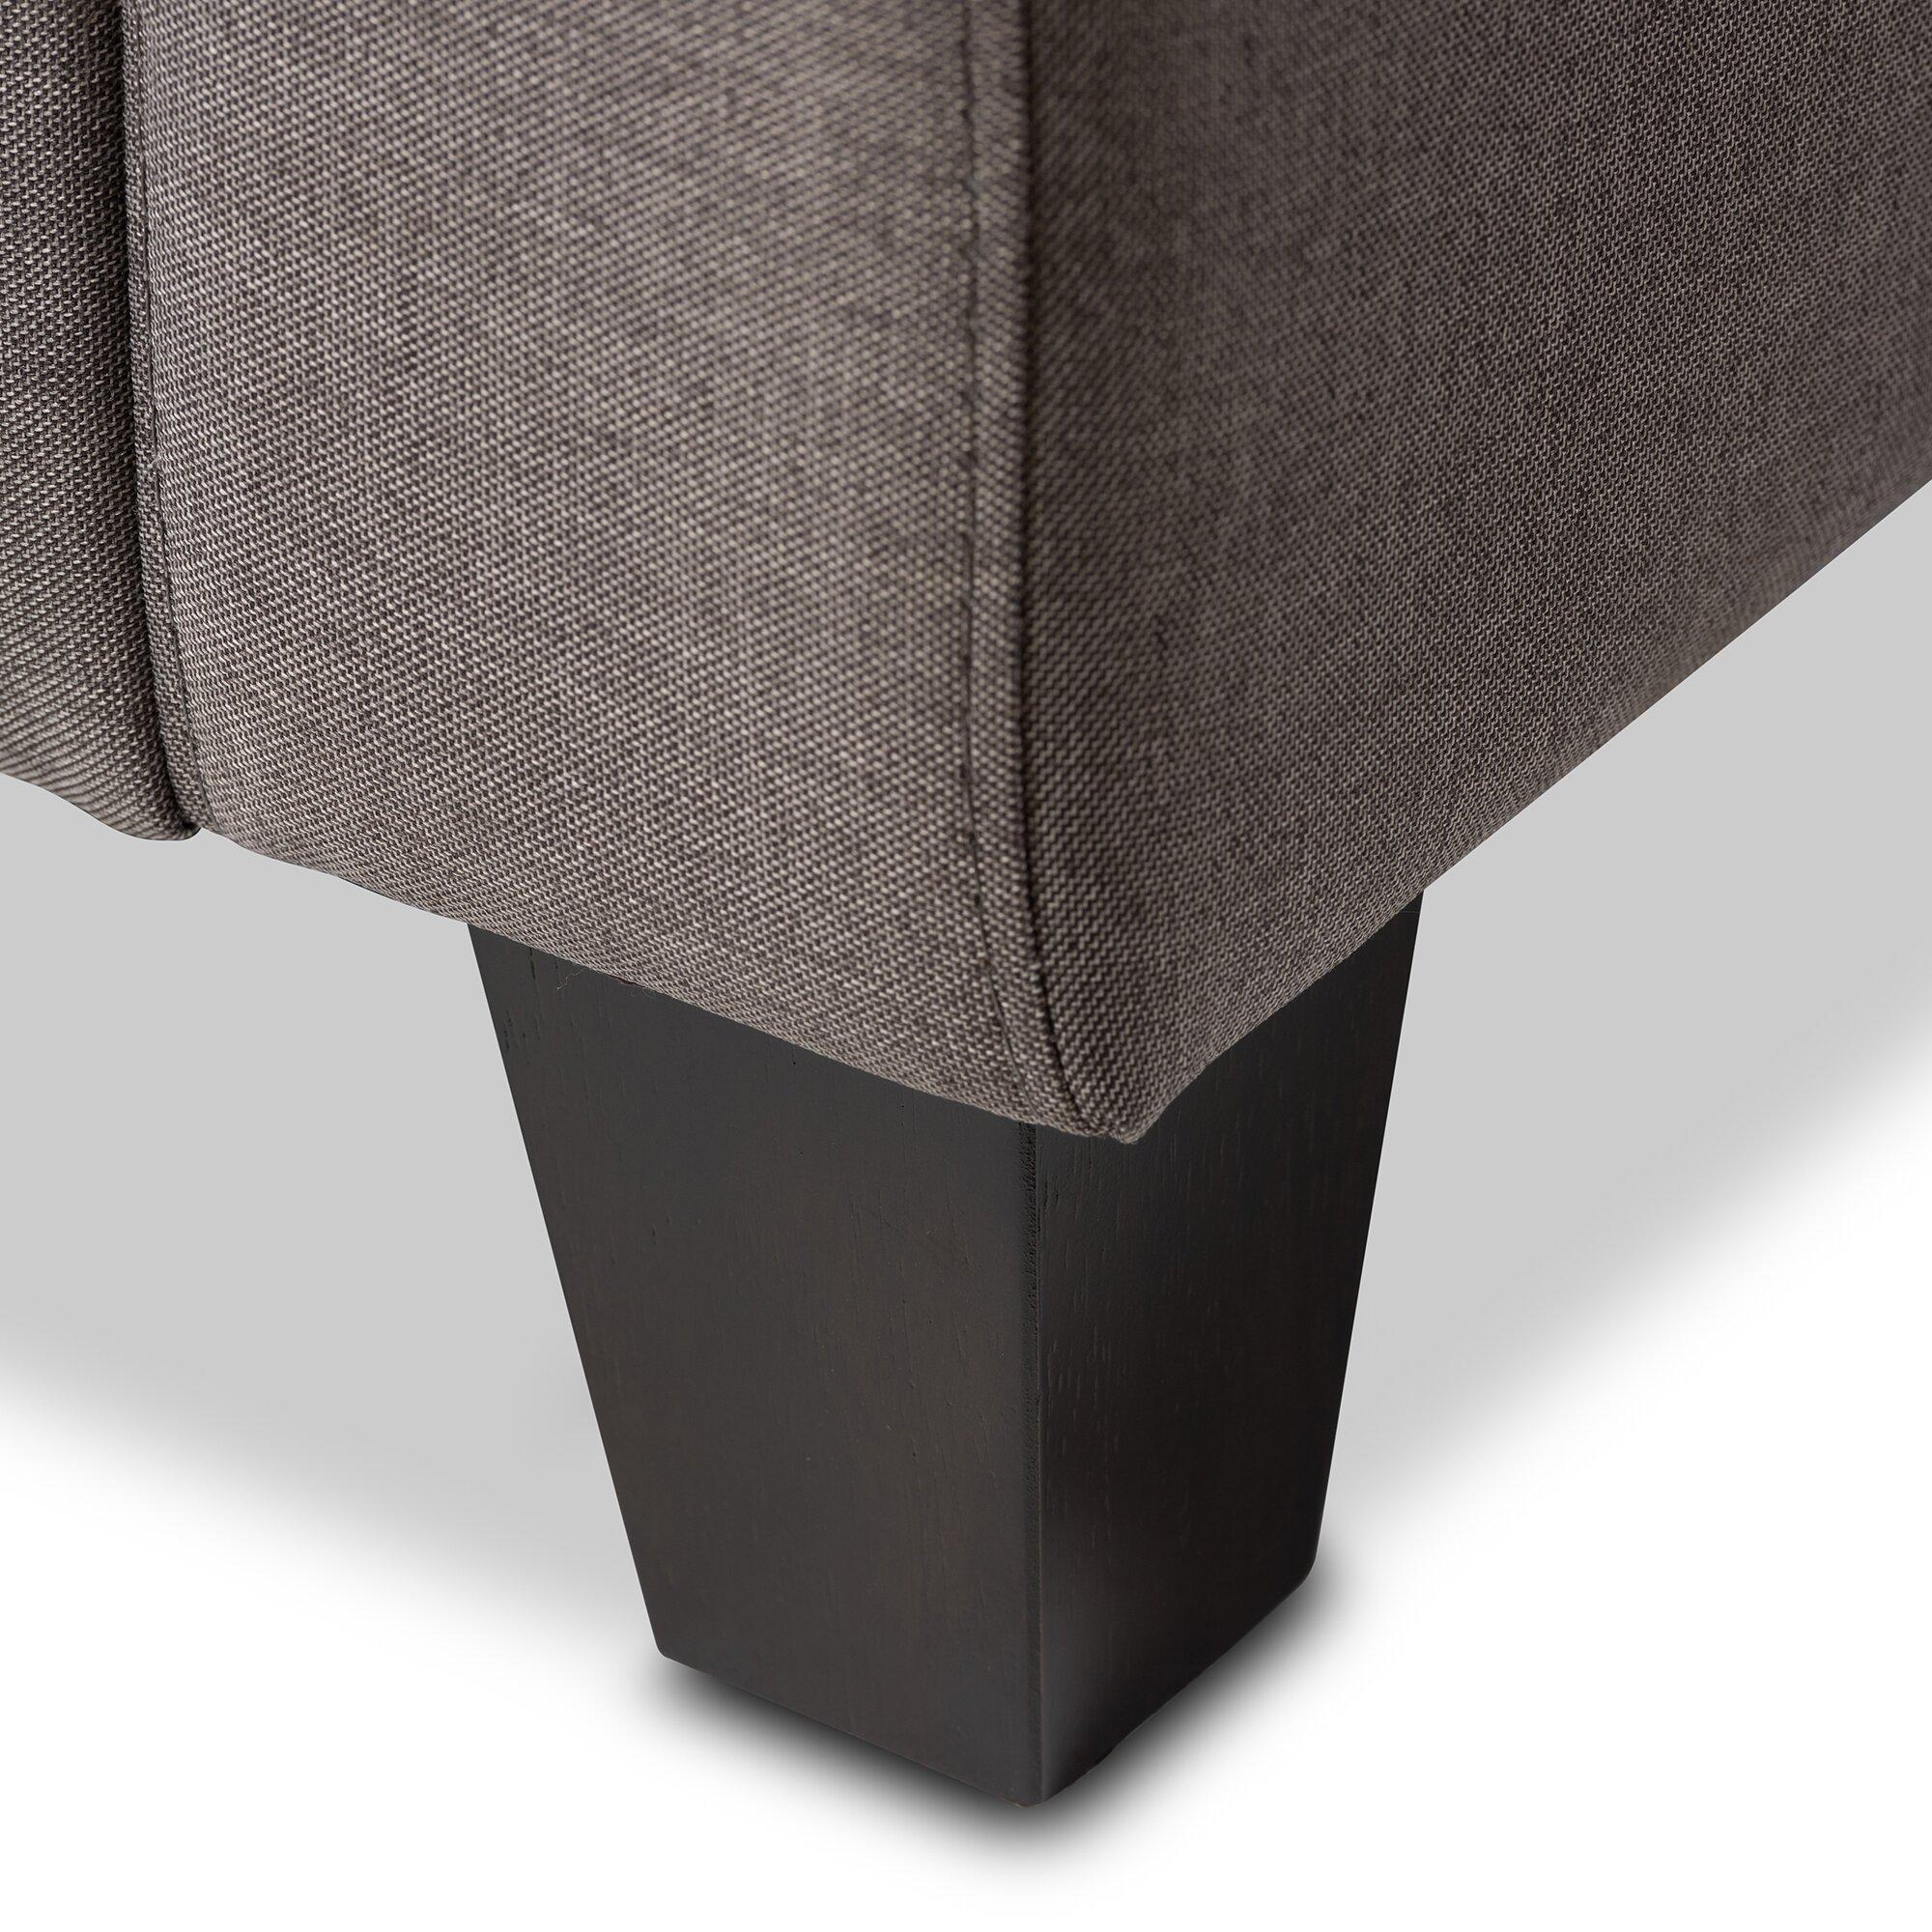 Baxton Studio Arcadia Modern And Contemporary Grey Fabric: Wholesale Interiors Baxton Studio Silvia Modern And